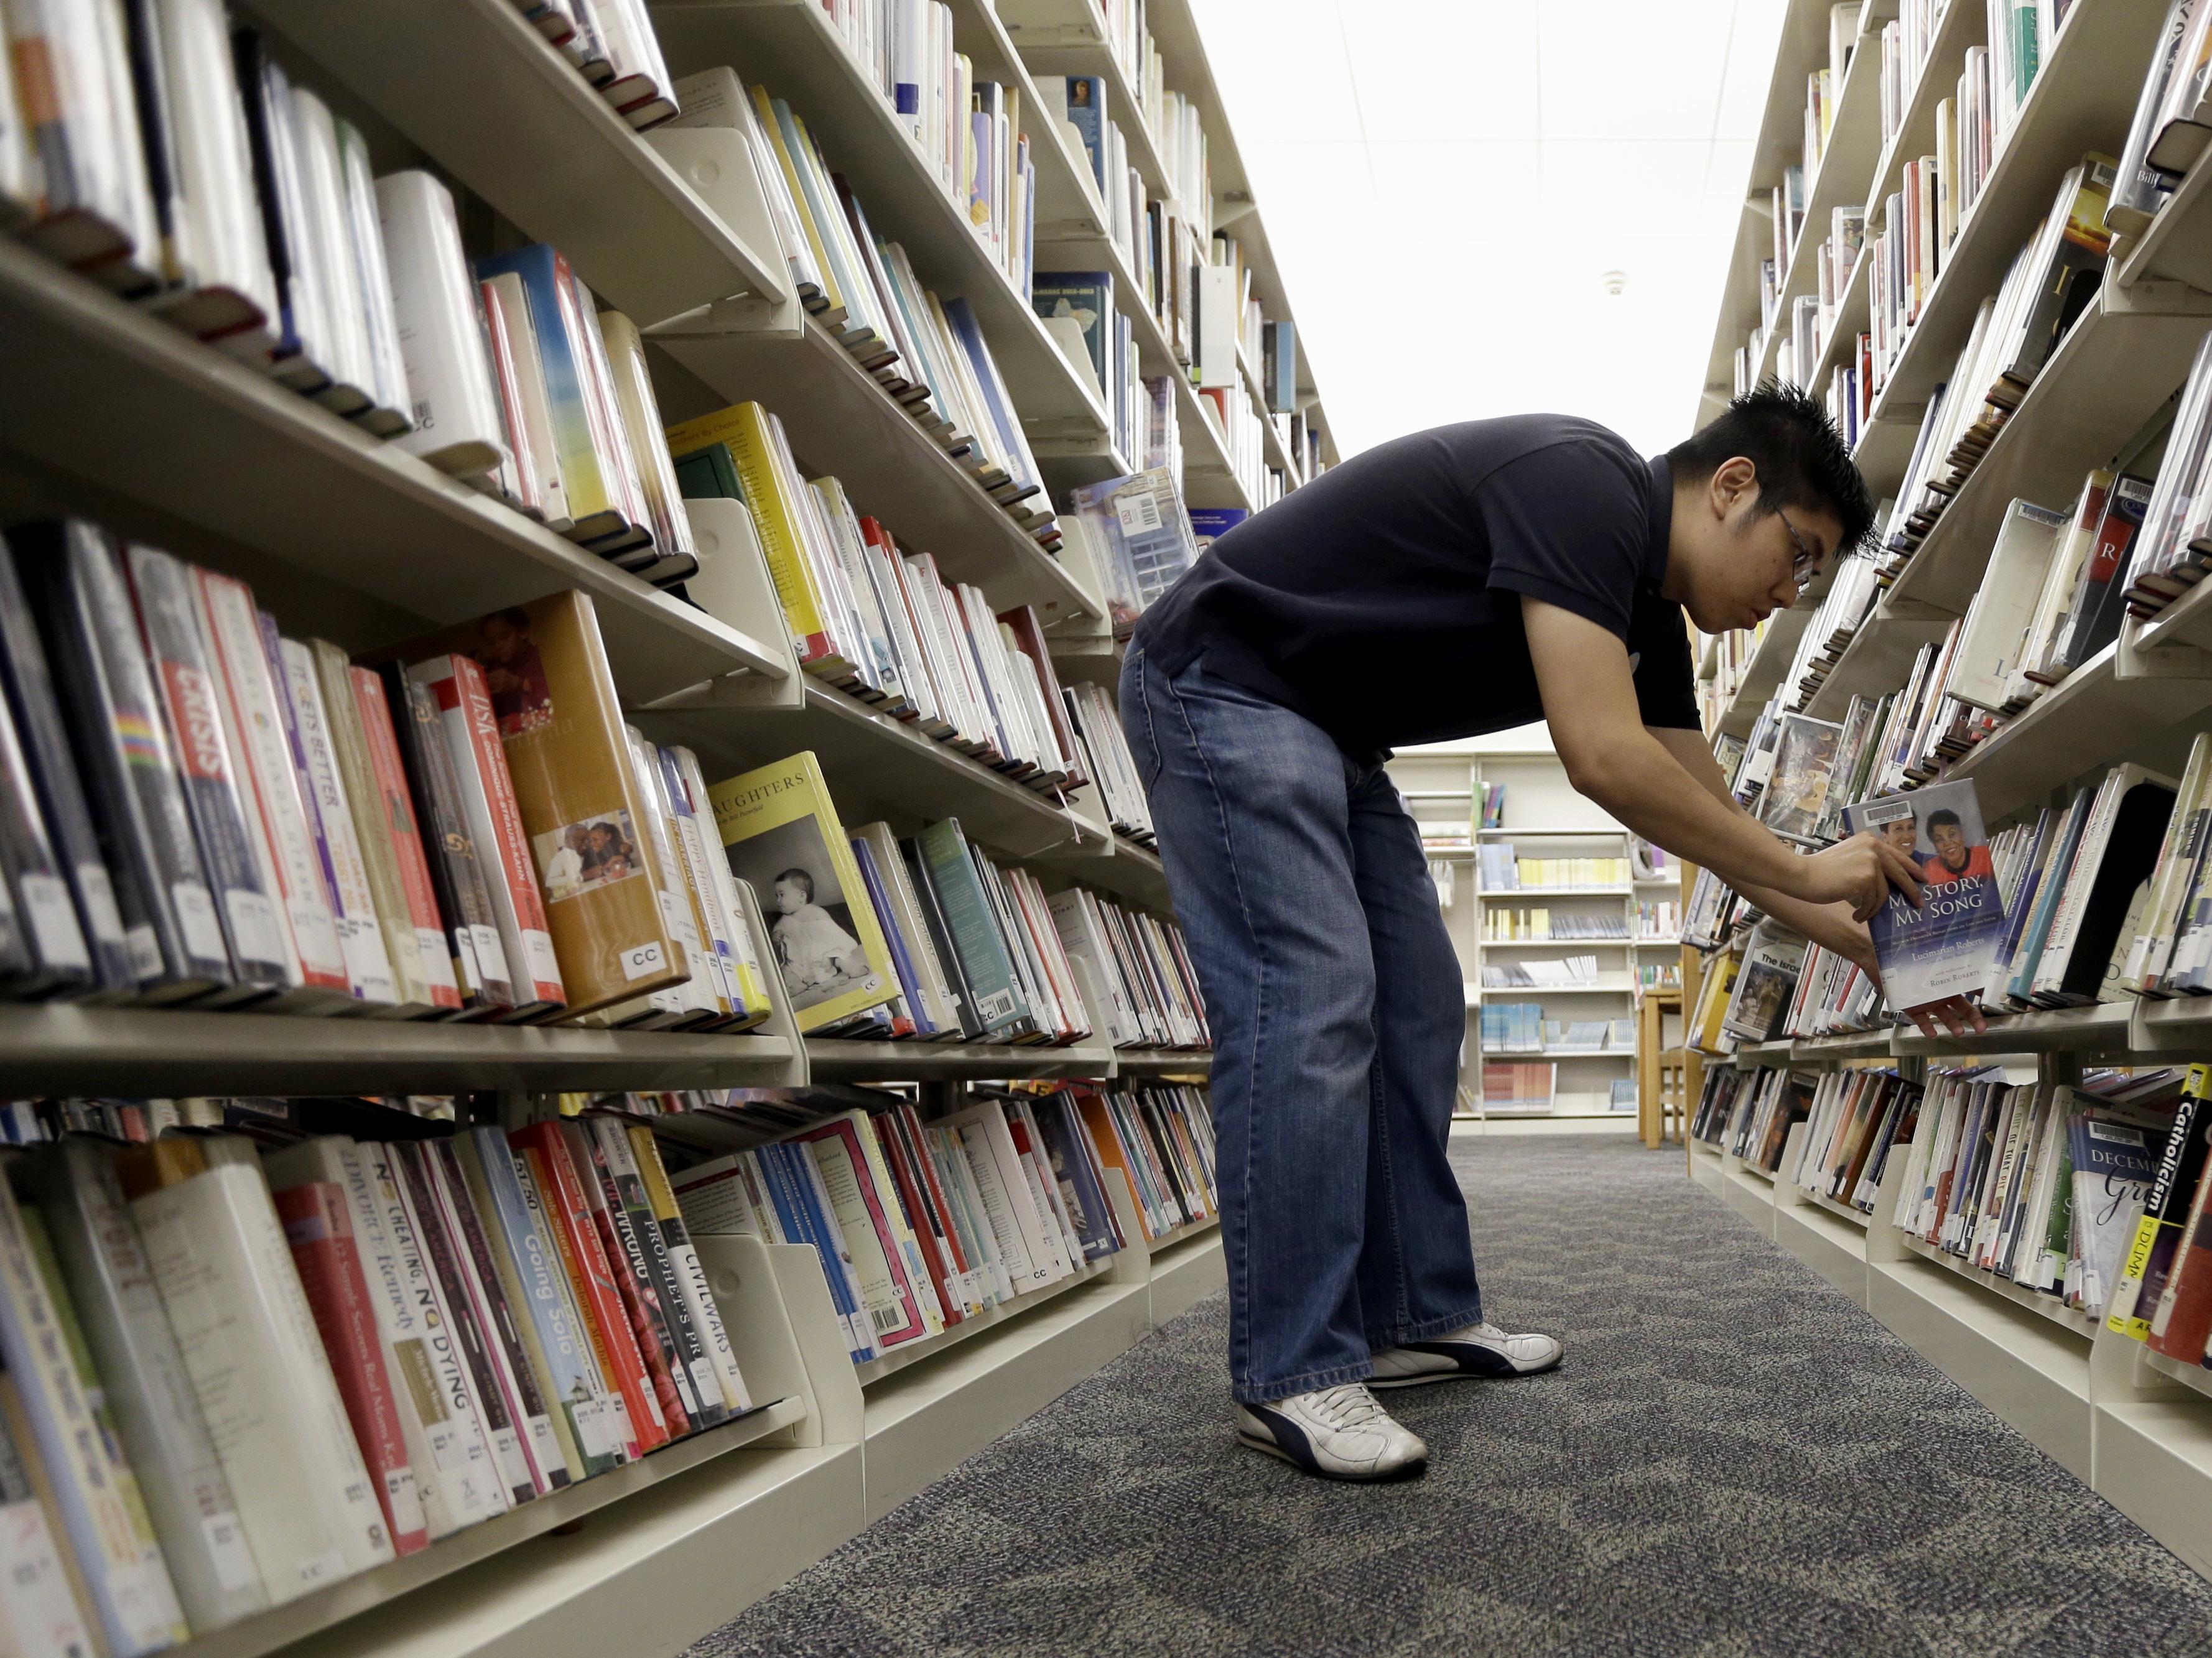 Health Overhaul Libraries